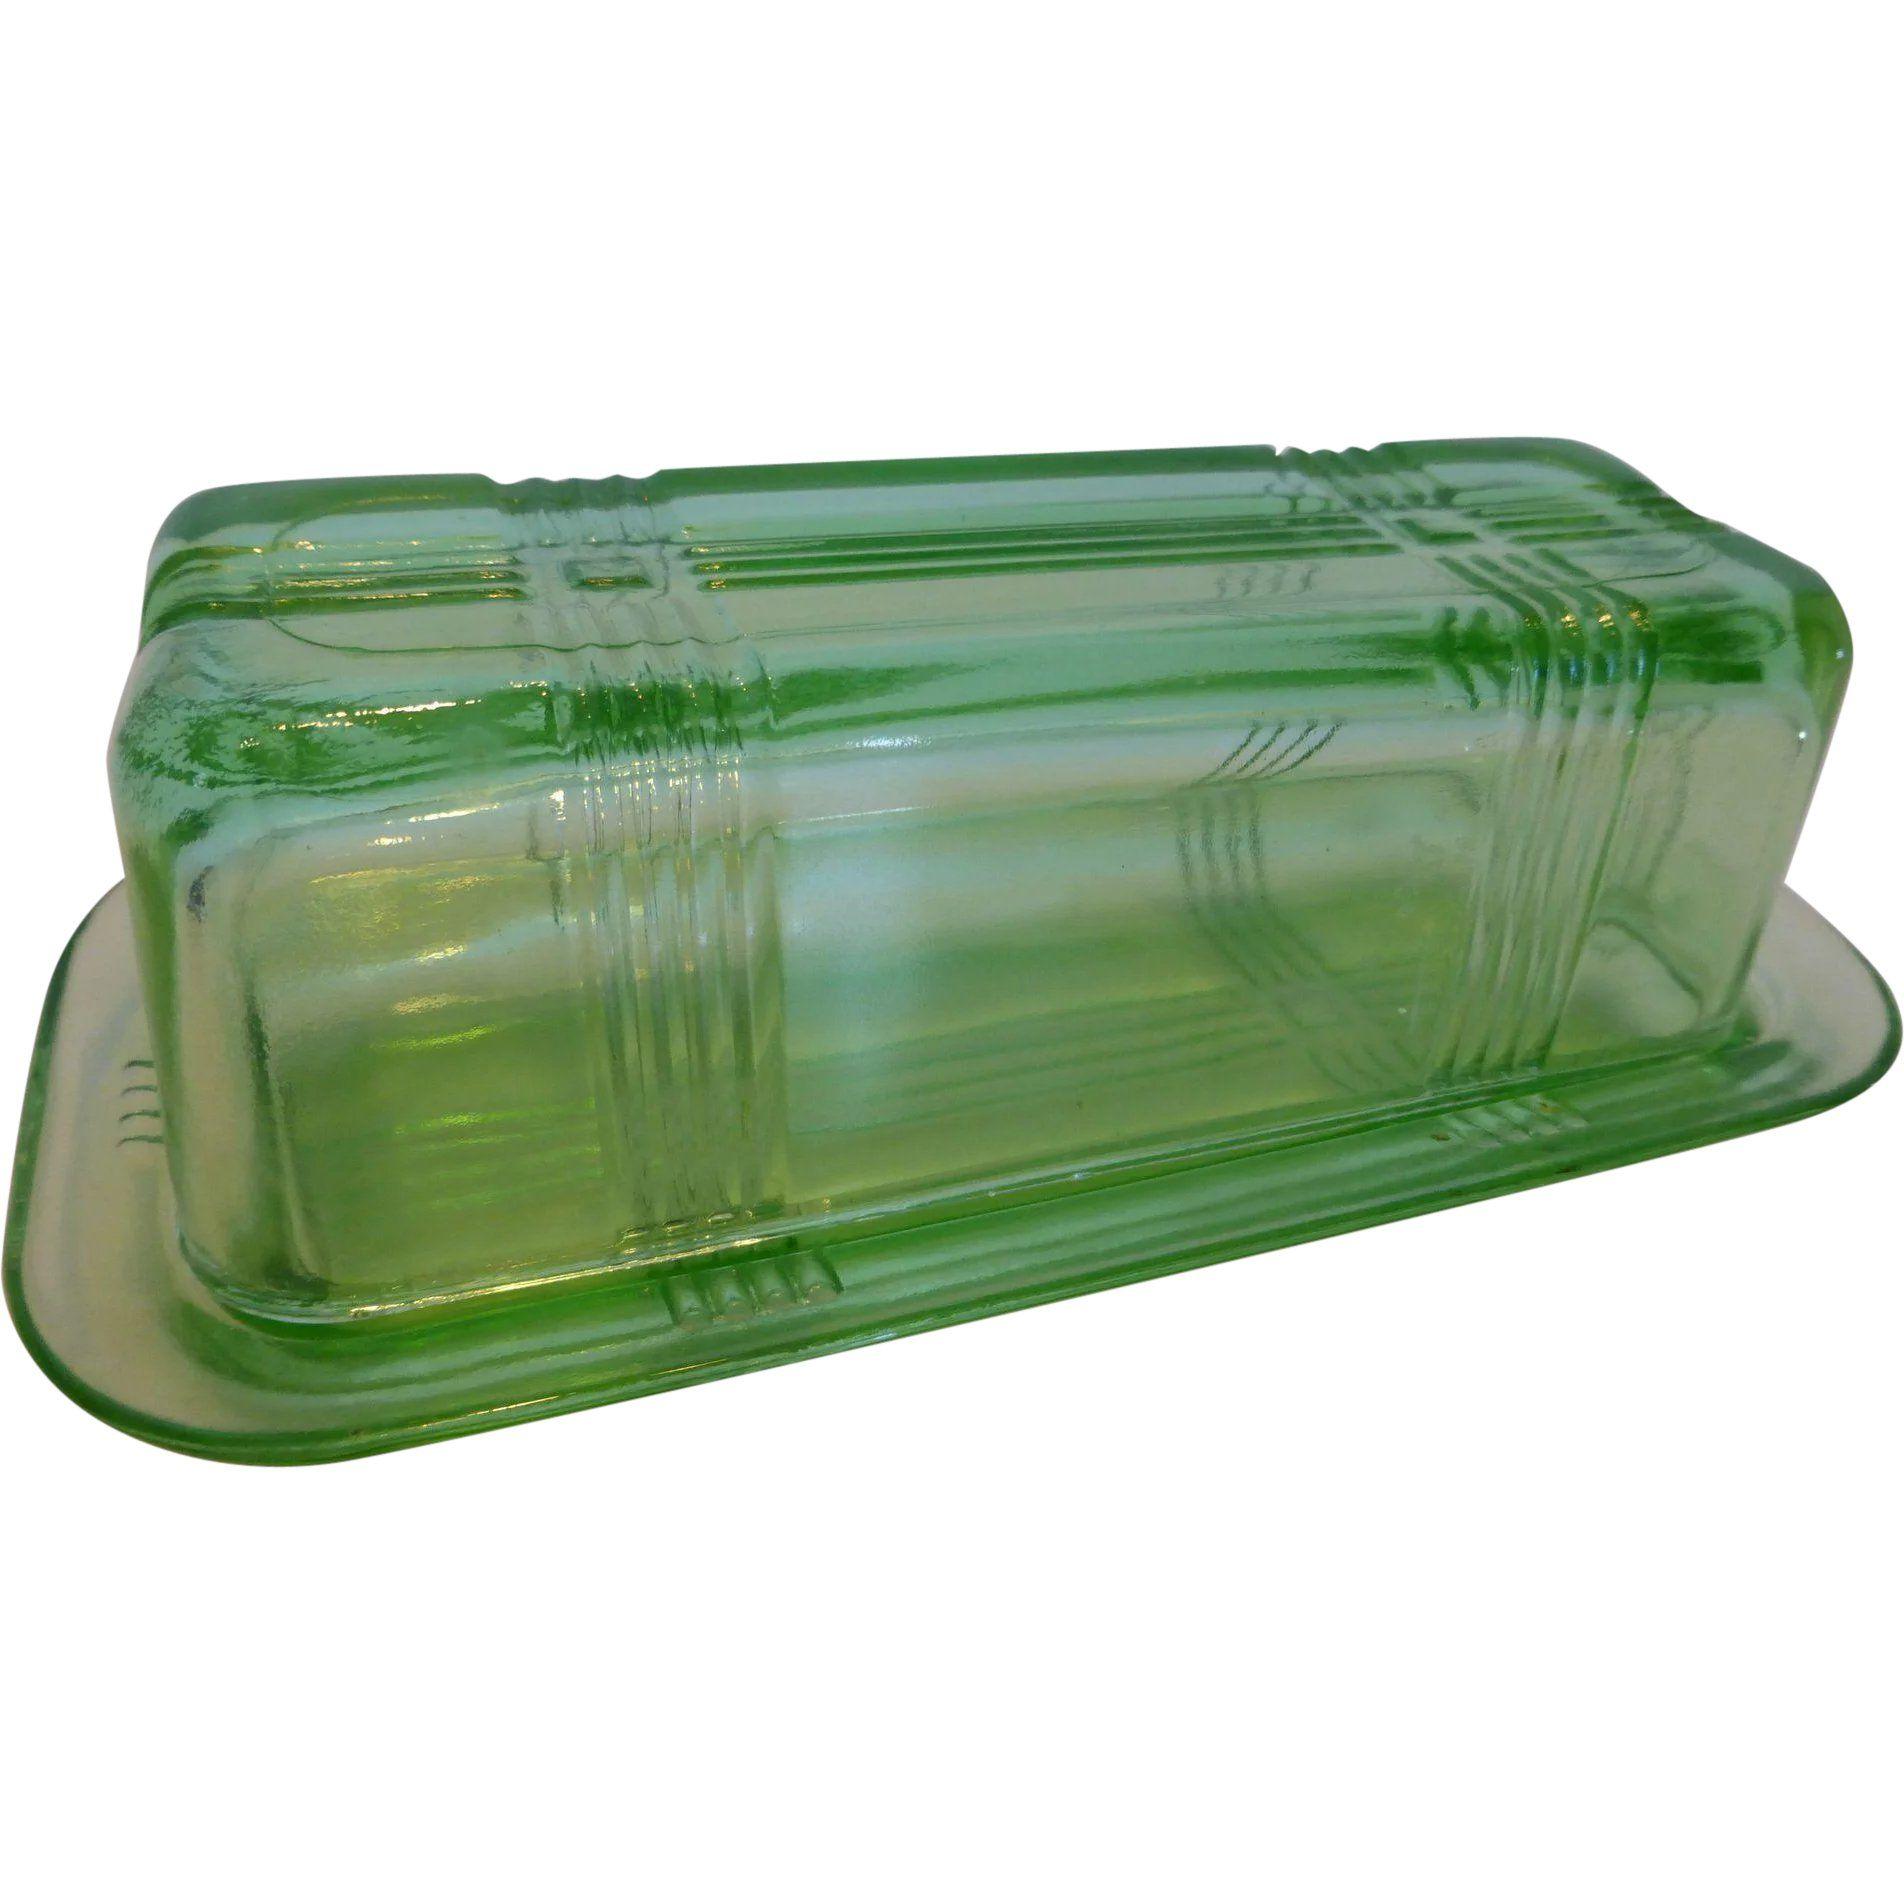 G609 Hazel Atlas Crisscross Green Glass Butter Dish W Lid 1 4 Lb Green Glass Vintage Kitchenware Glass